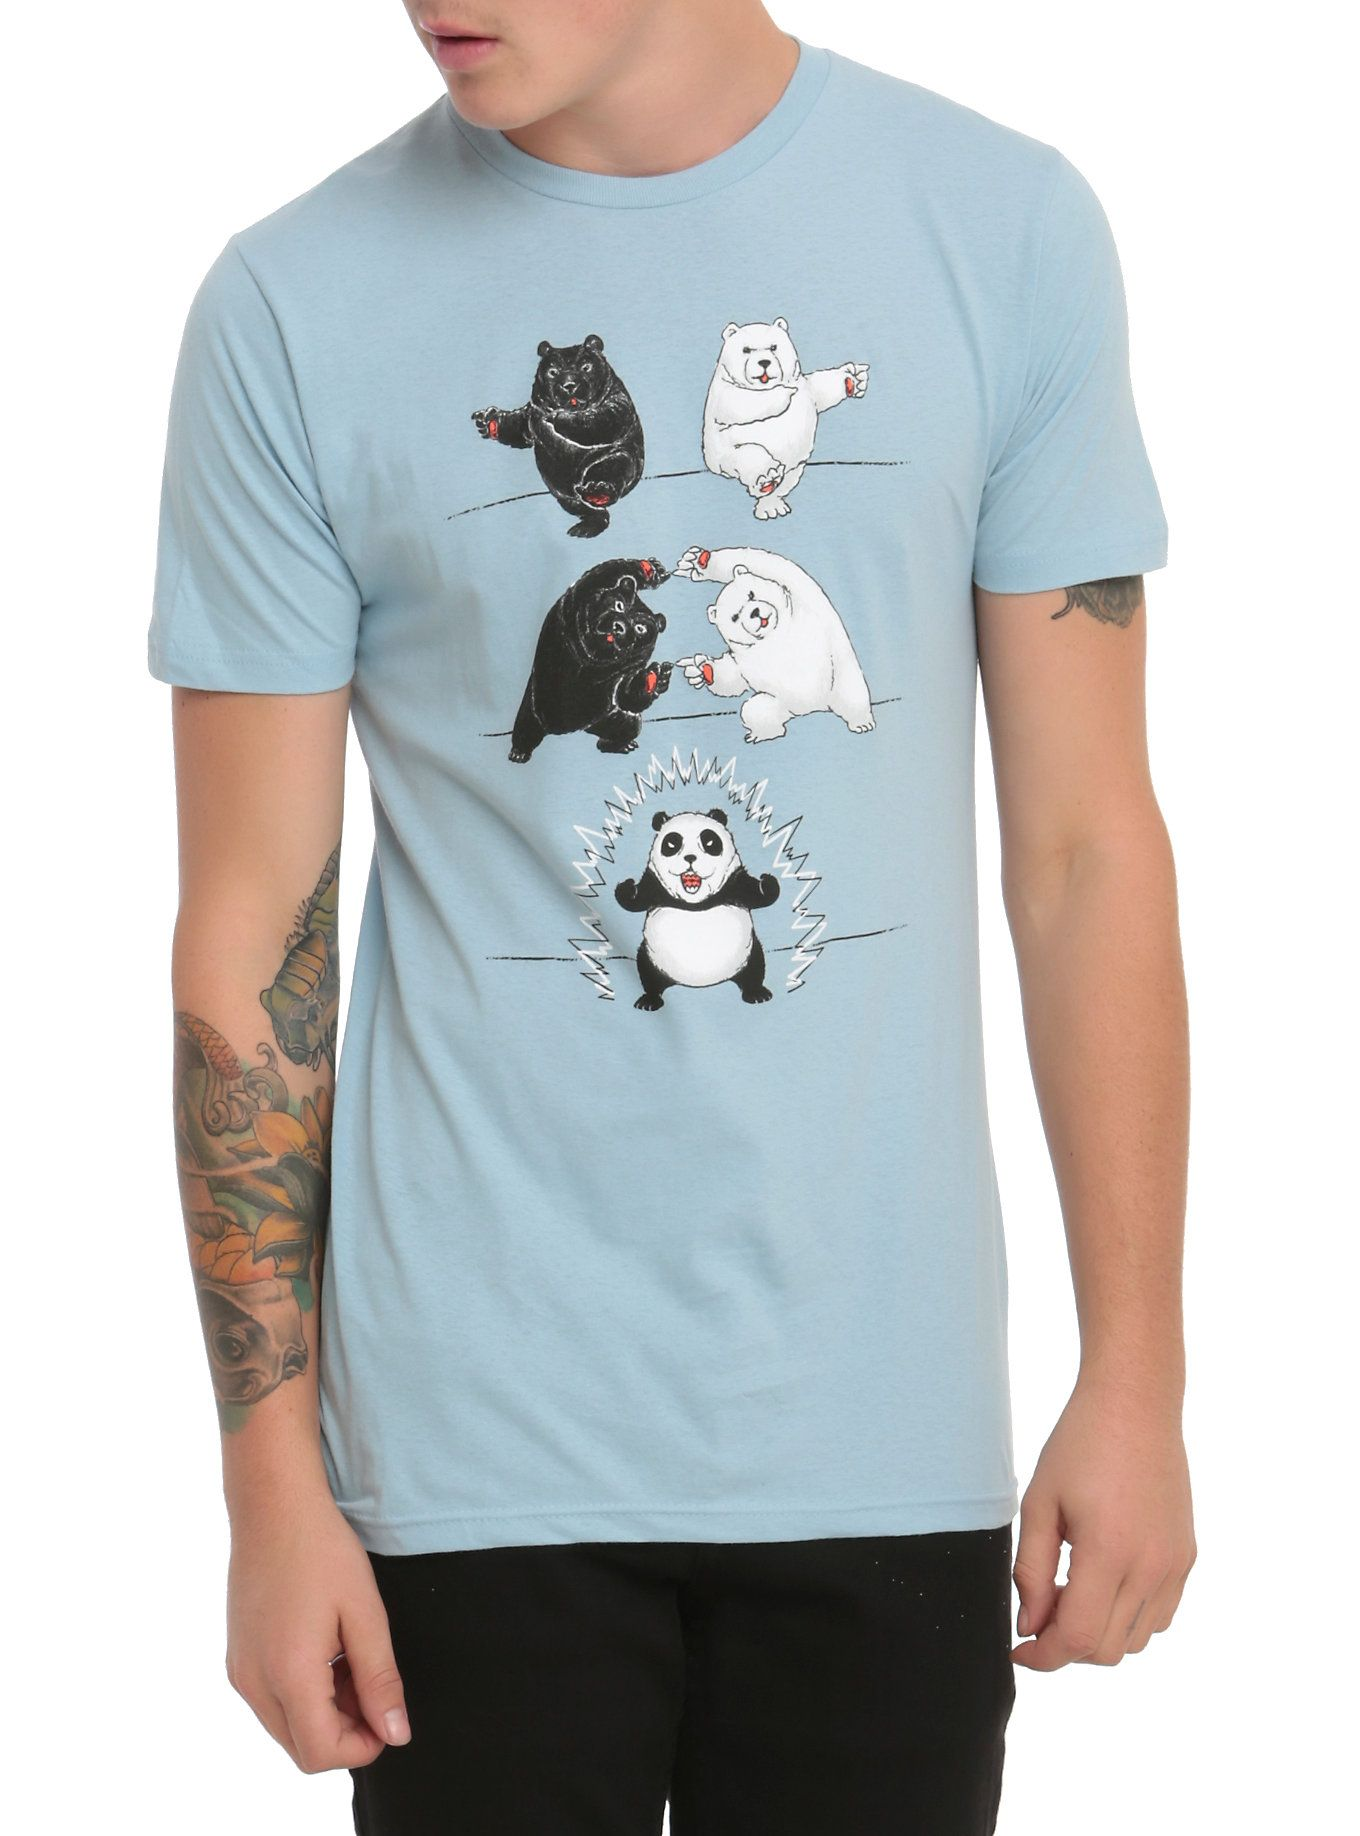 91086e46404e8 Ultimate Fusion Panda T-Shirt | Birthday Wishlist | Shirts, Graphic ...